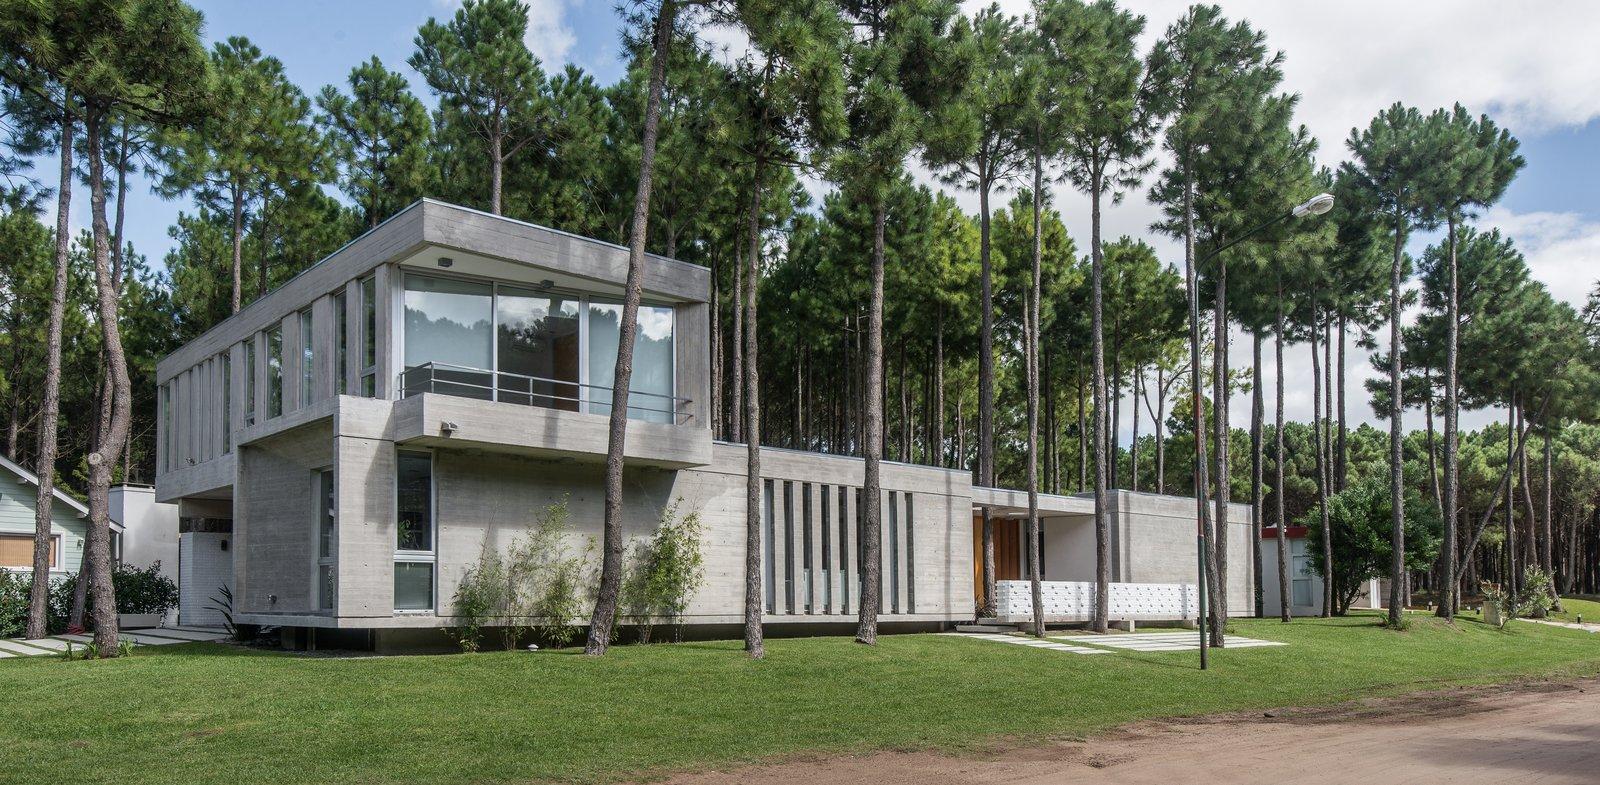 Tagged: Outdoor, Front Yard, and Trees.  Casa Batin by Estudio Galera